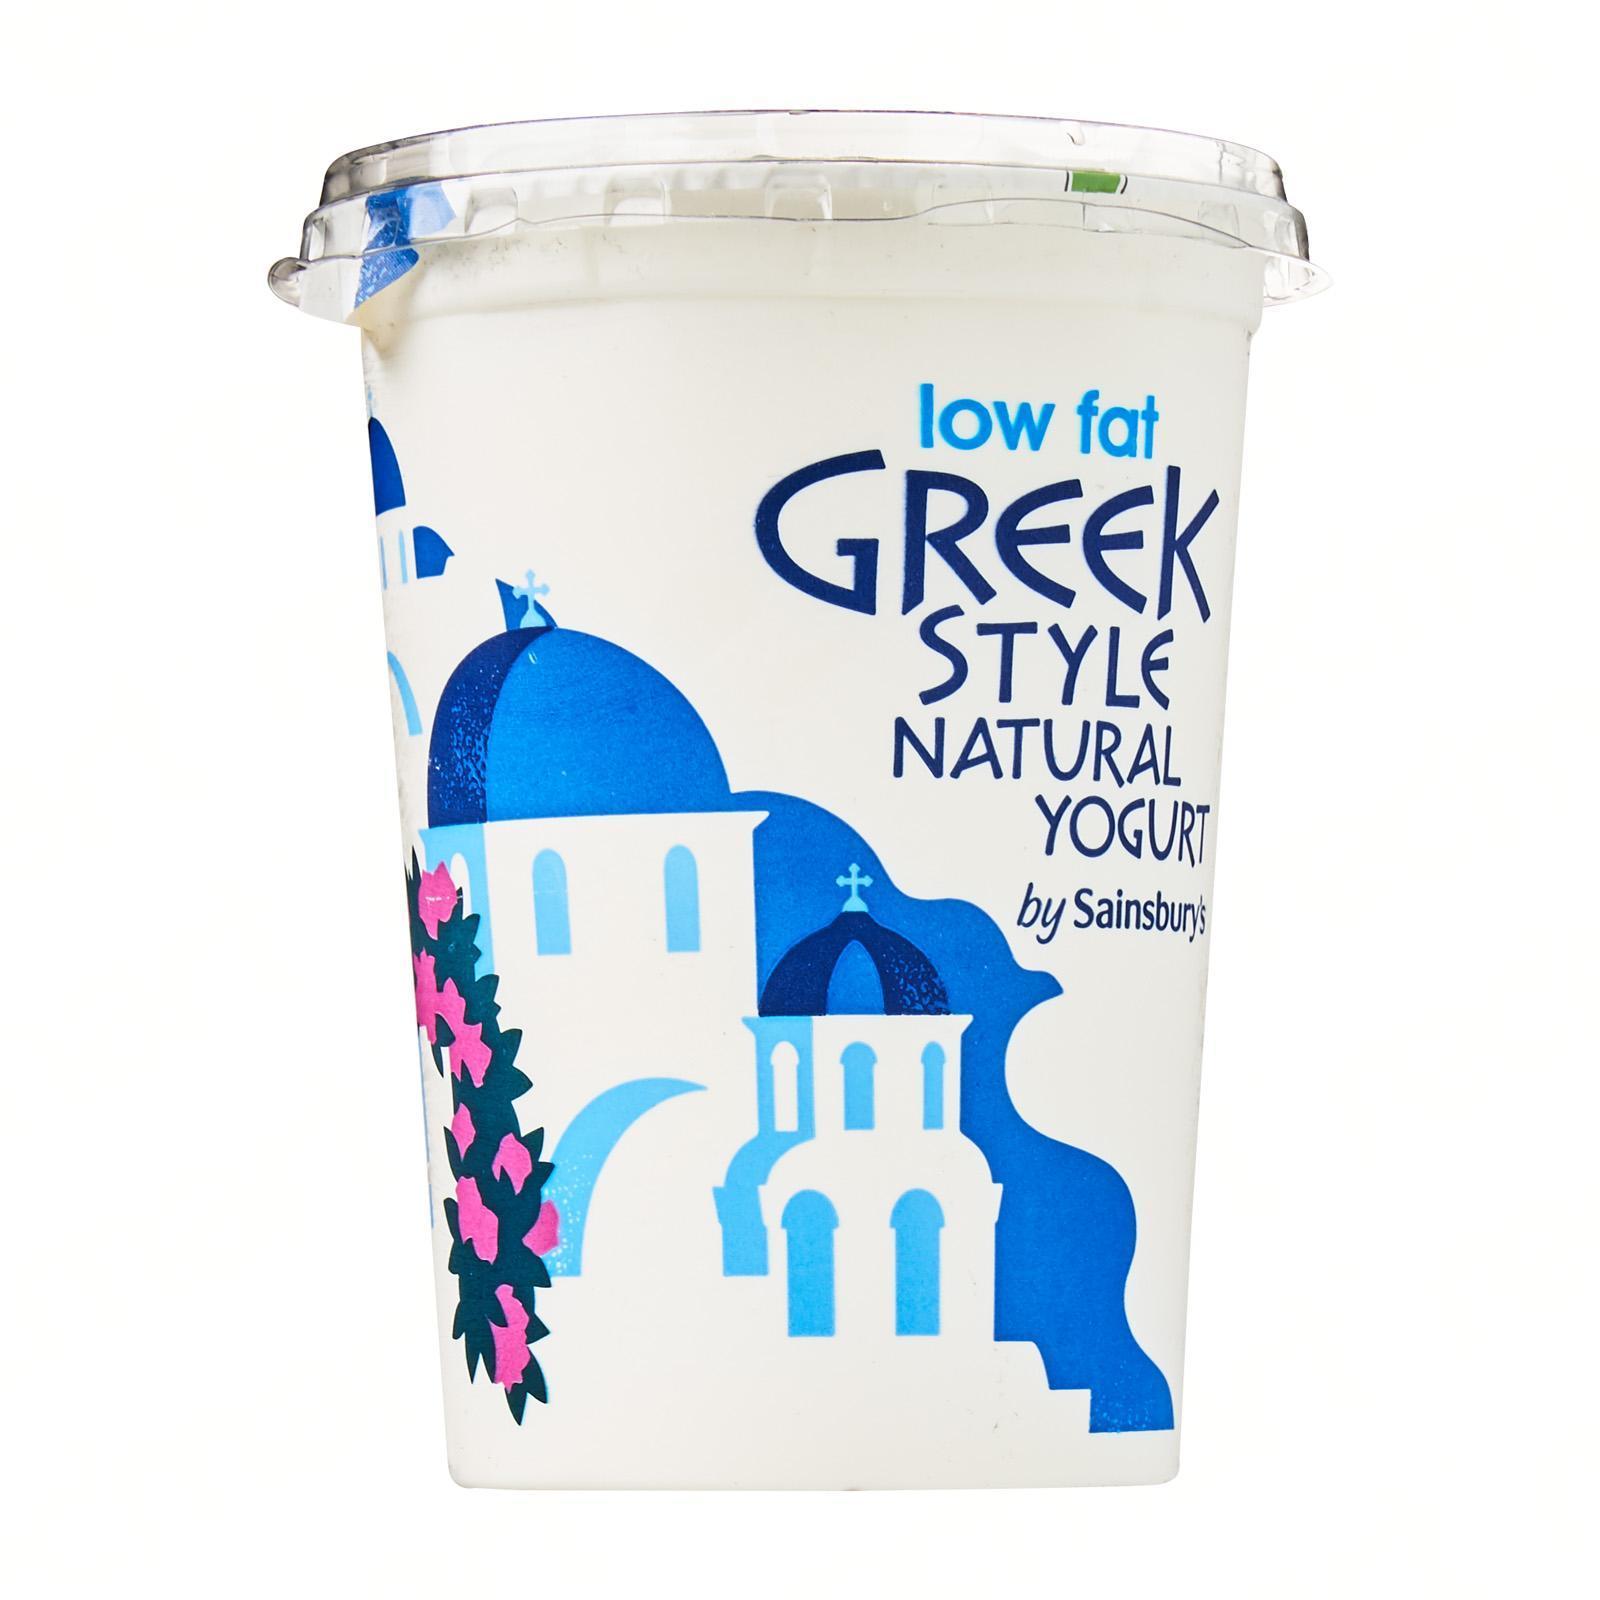 Sainsbury's Low Fat Greek Style Natural Yoghurt